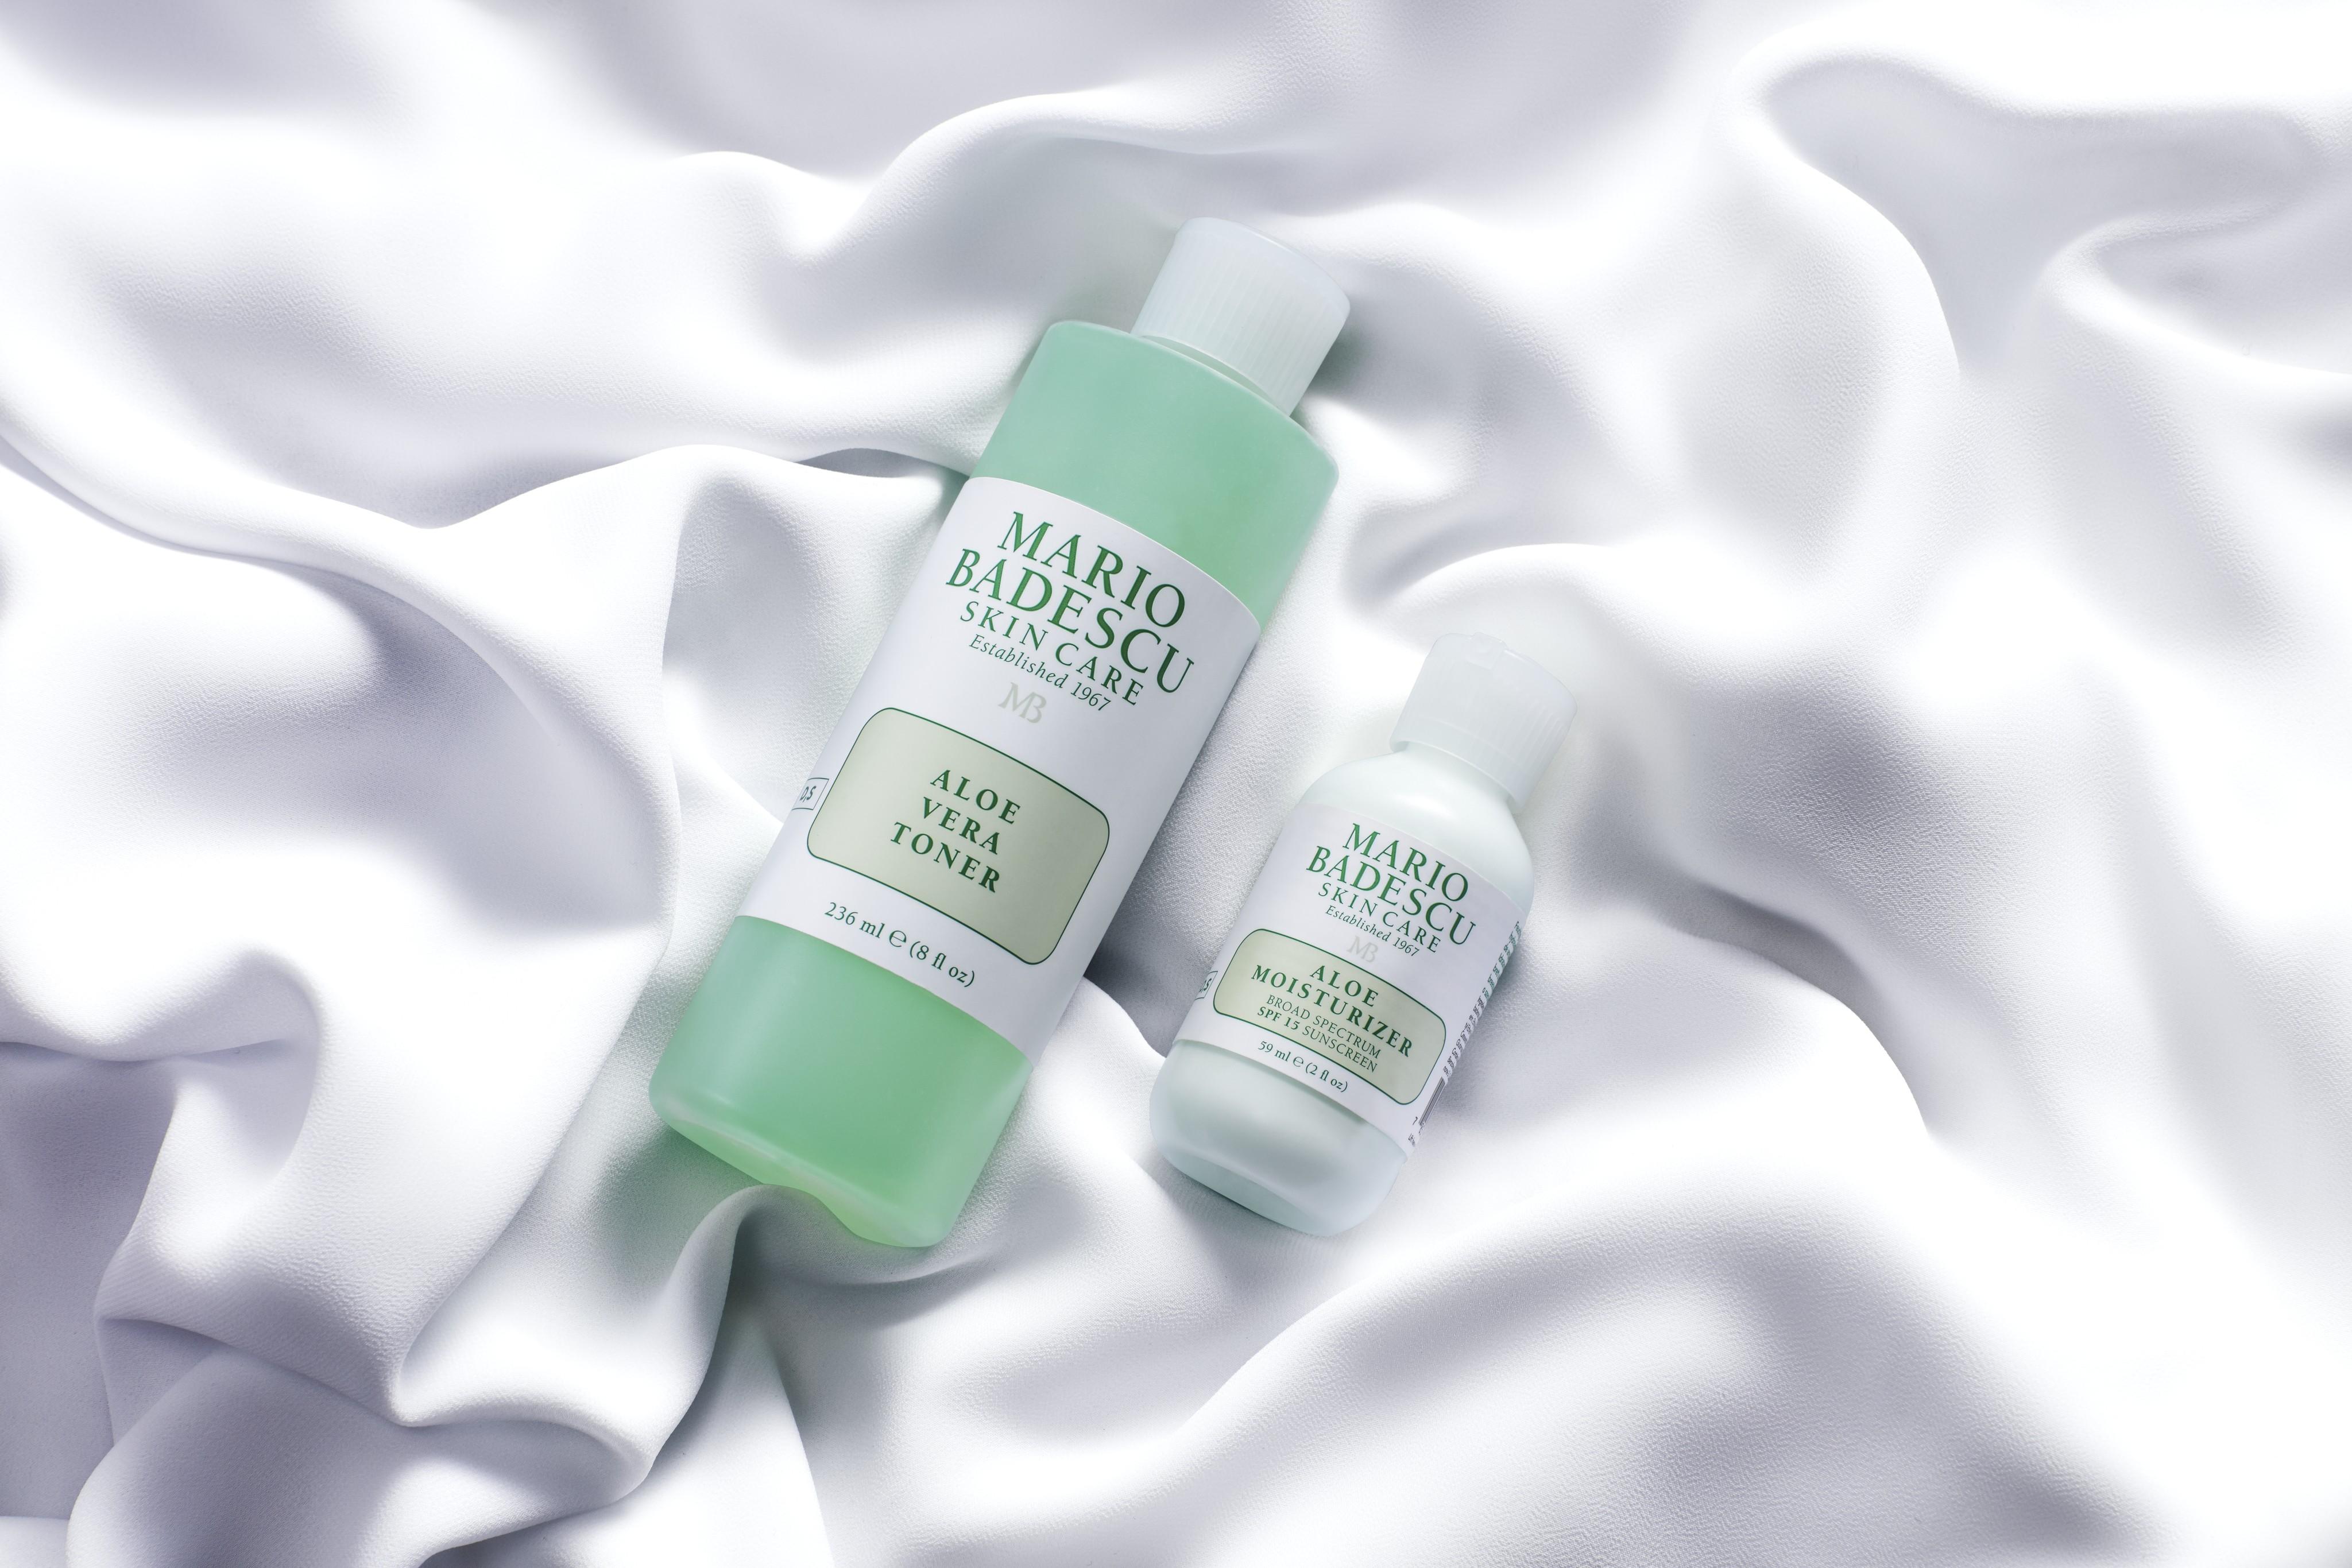 Skincare-product-sensitive-skin-mario-badescu-skincare-white-silk-unlimited-Web-Rendition